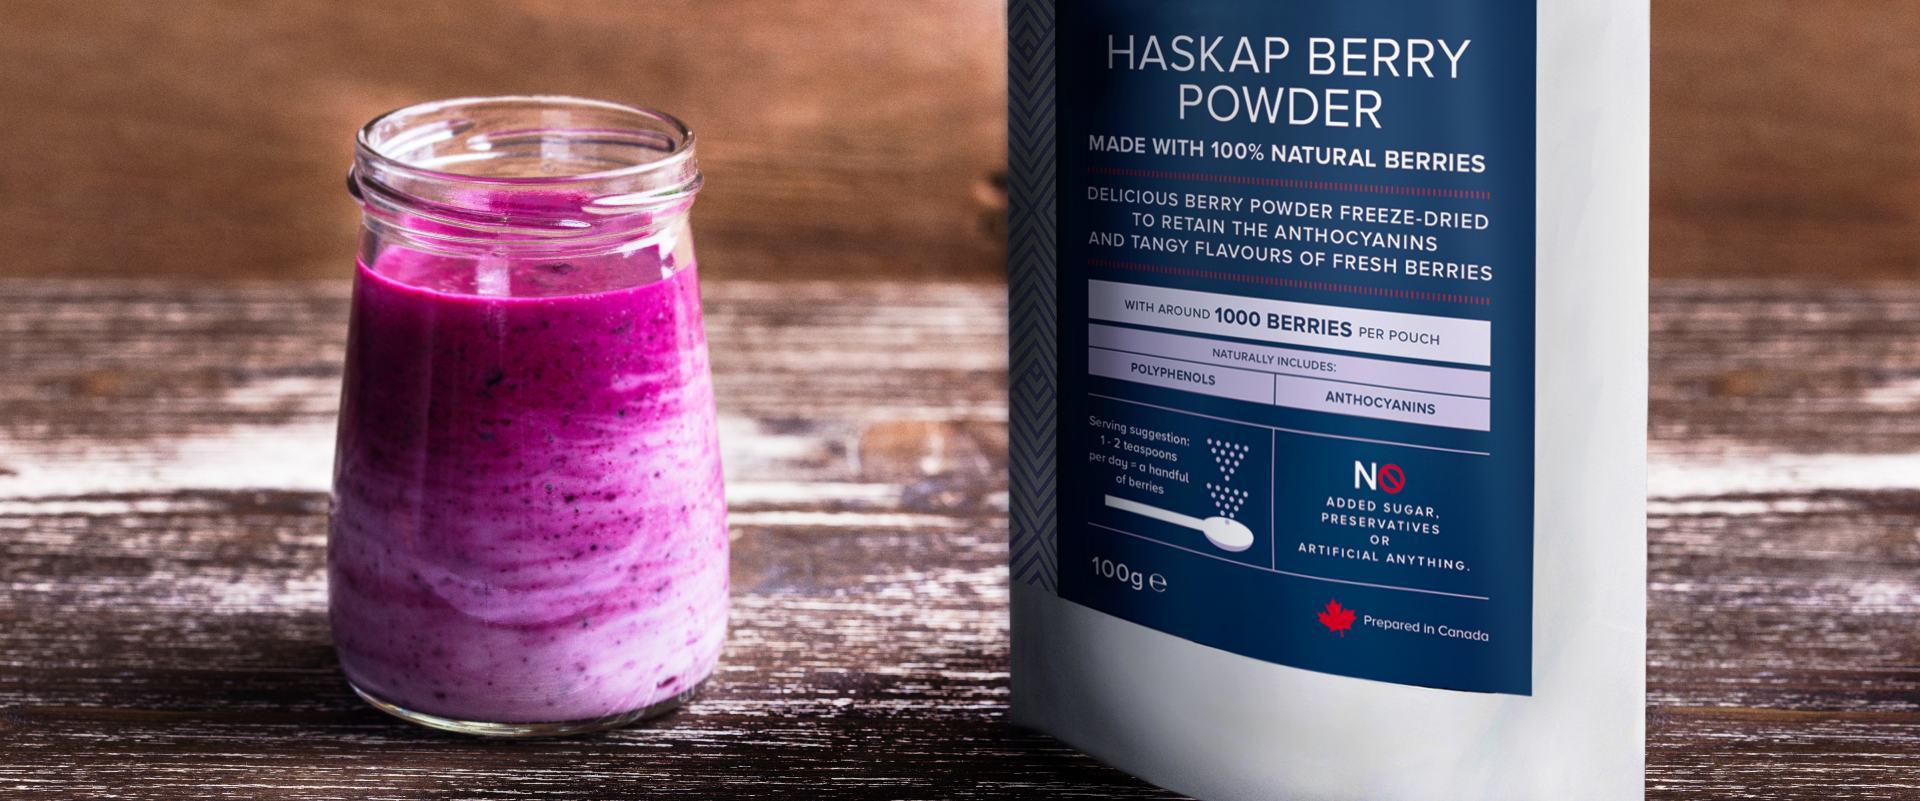 Haskapa_Yogurt